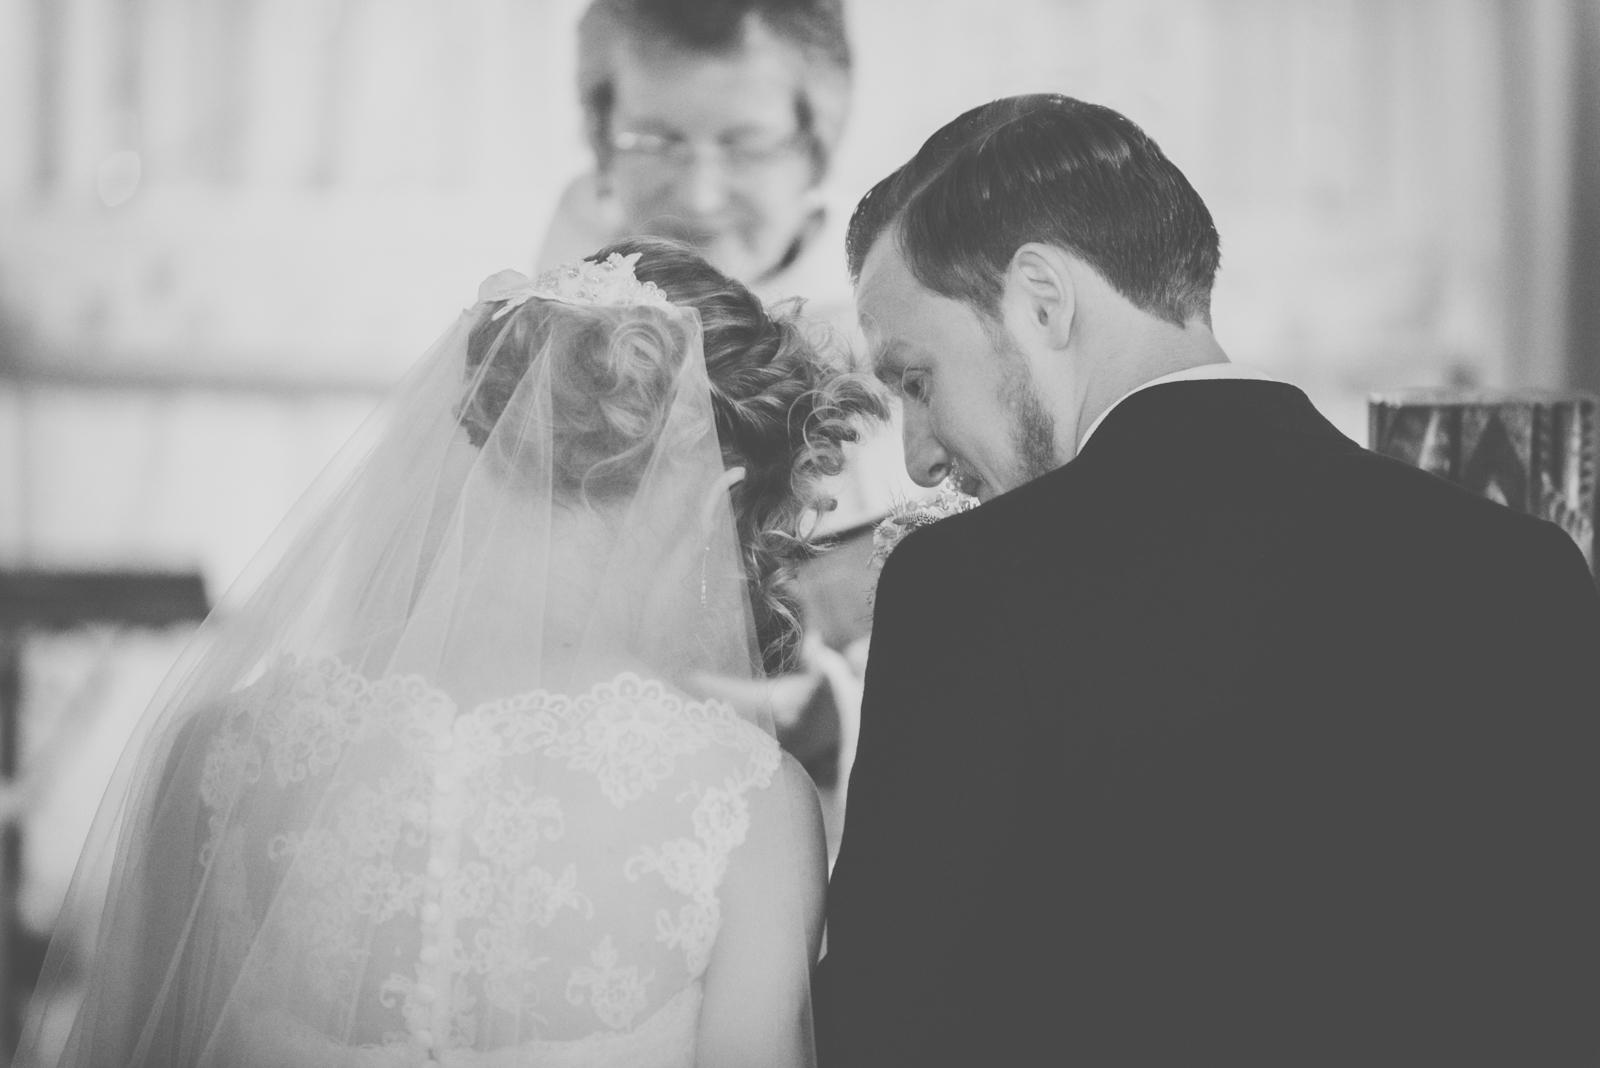 wedding-photography-rock-57.jpg